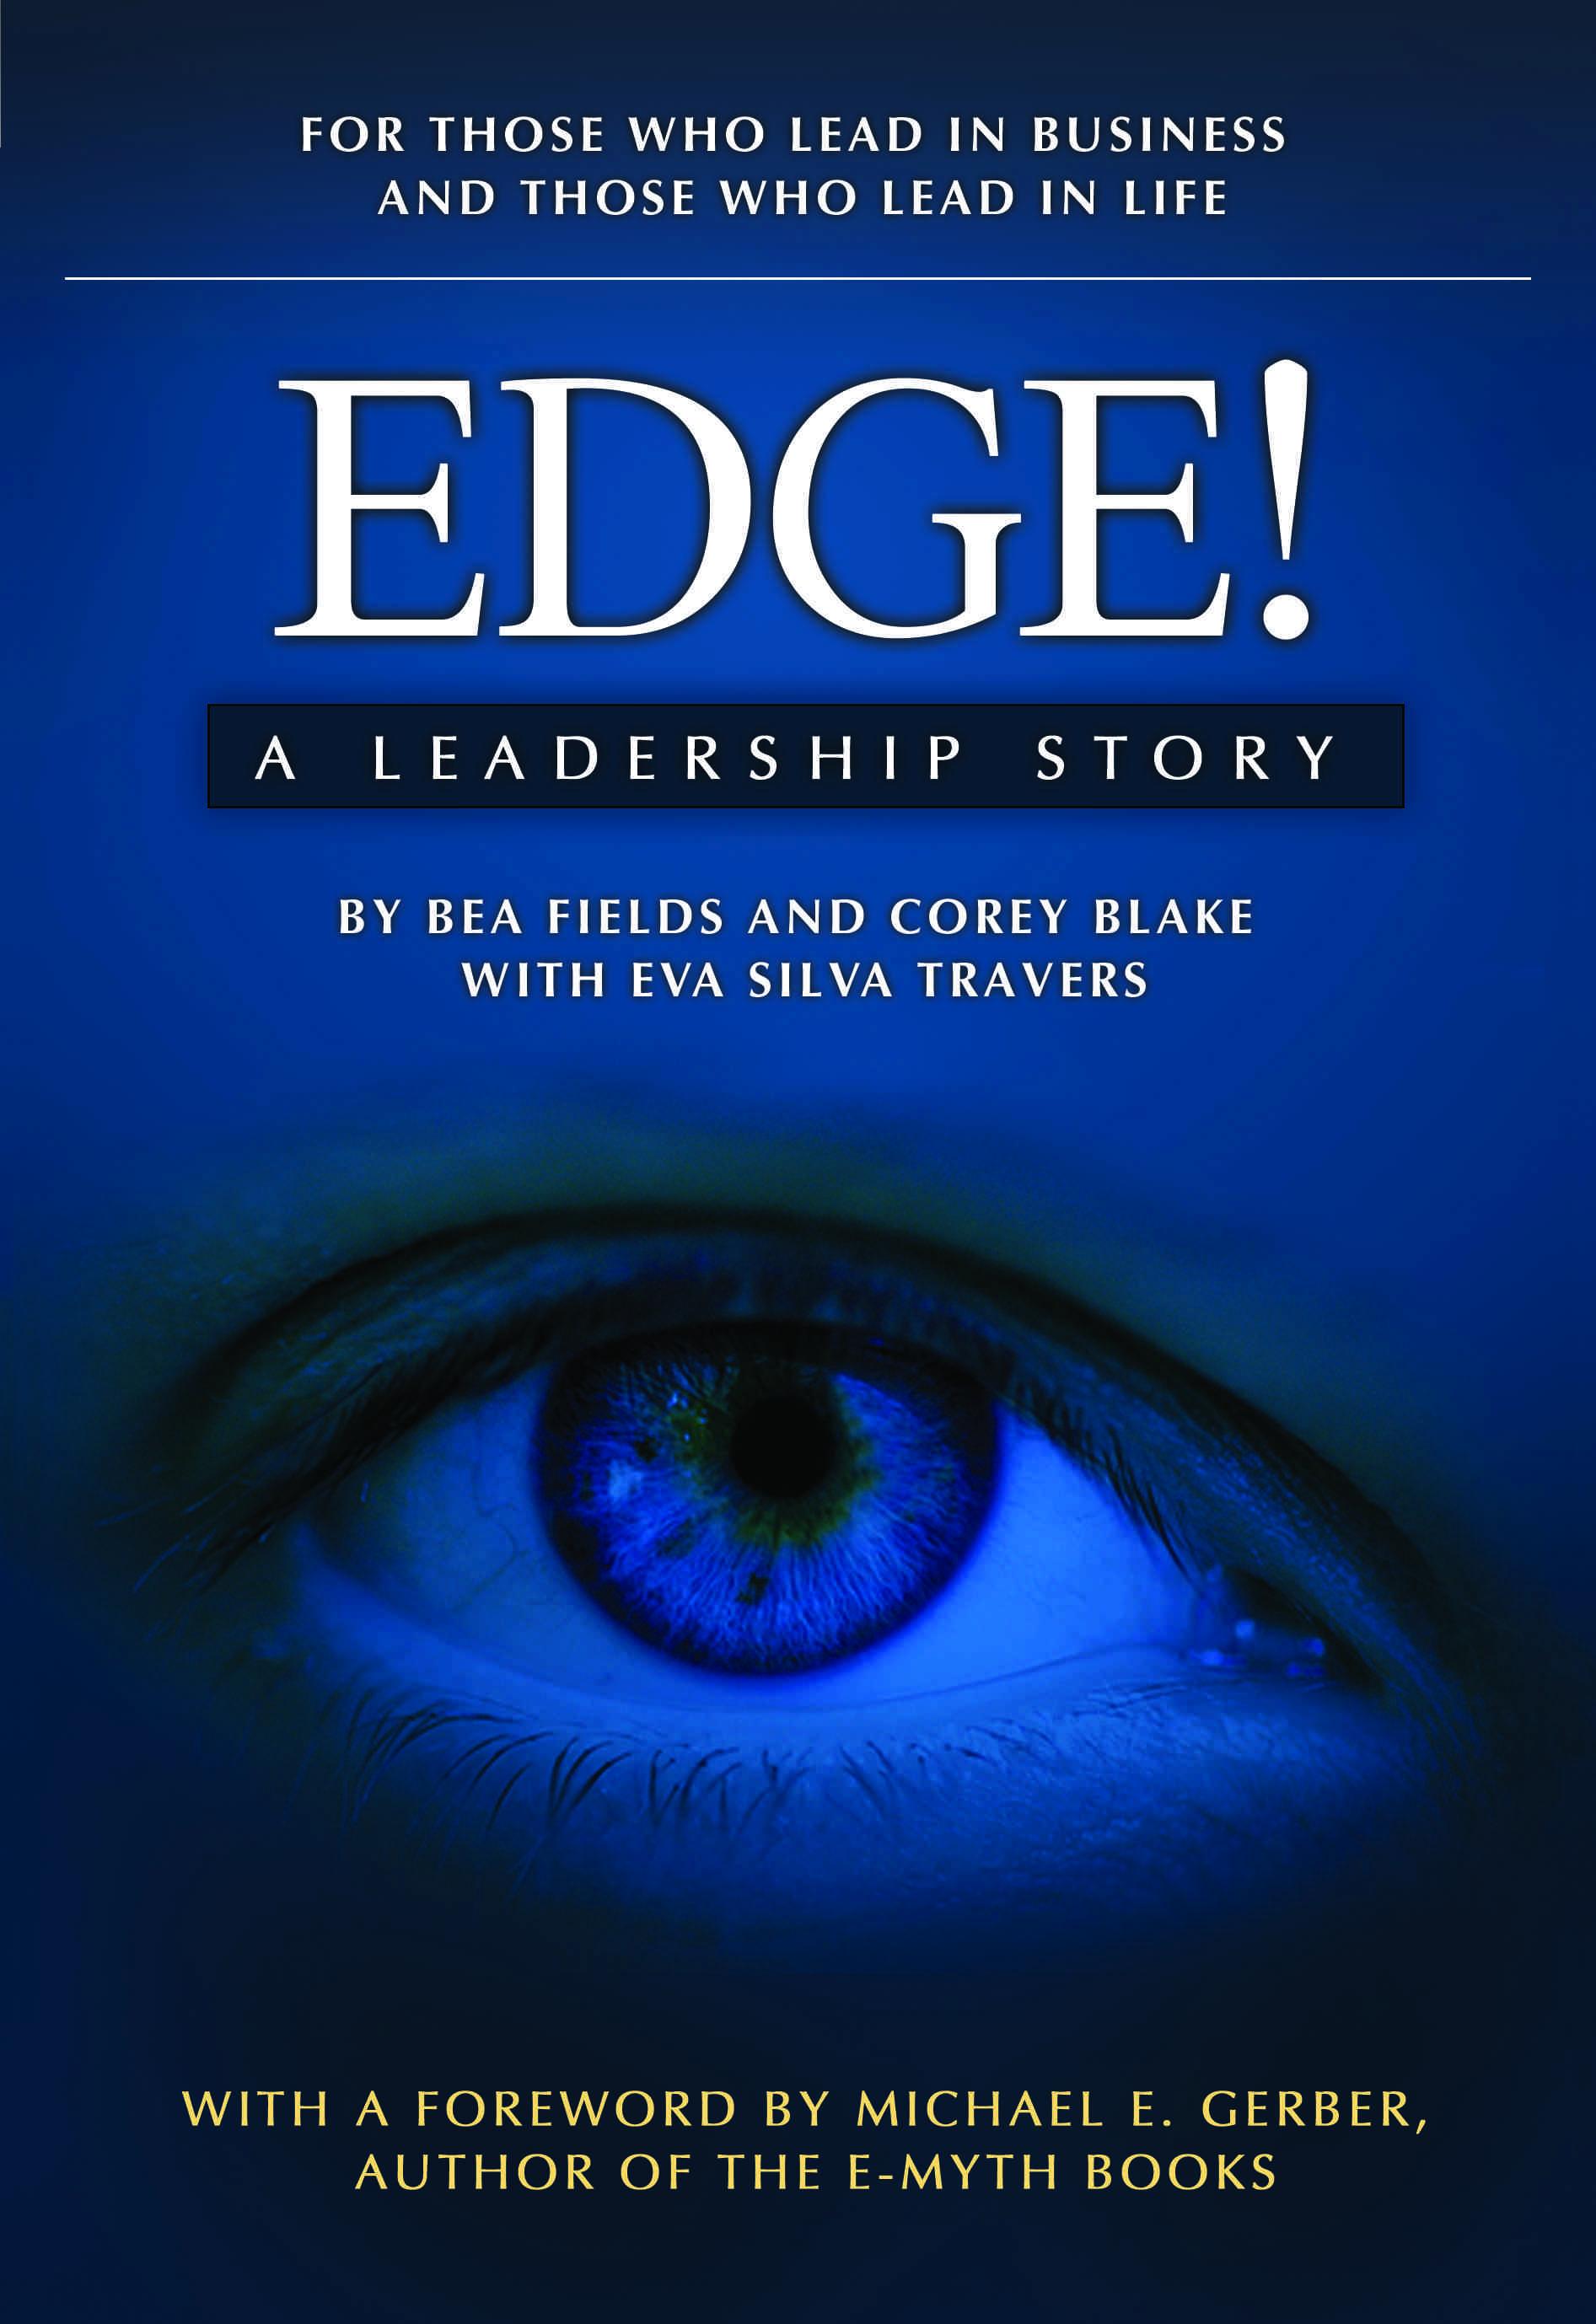 Edge! A Leadership Story